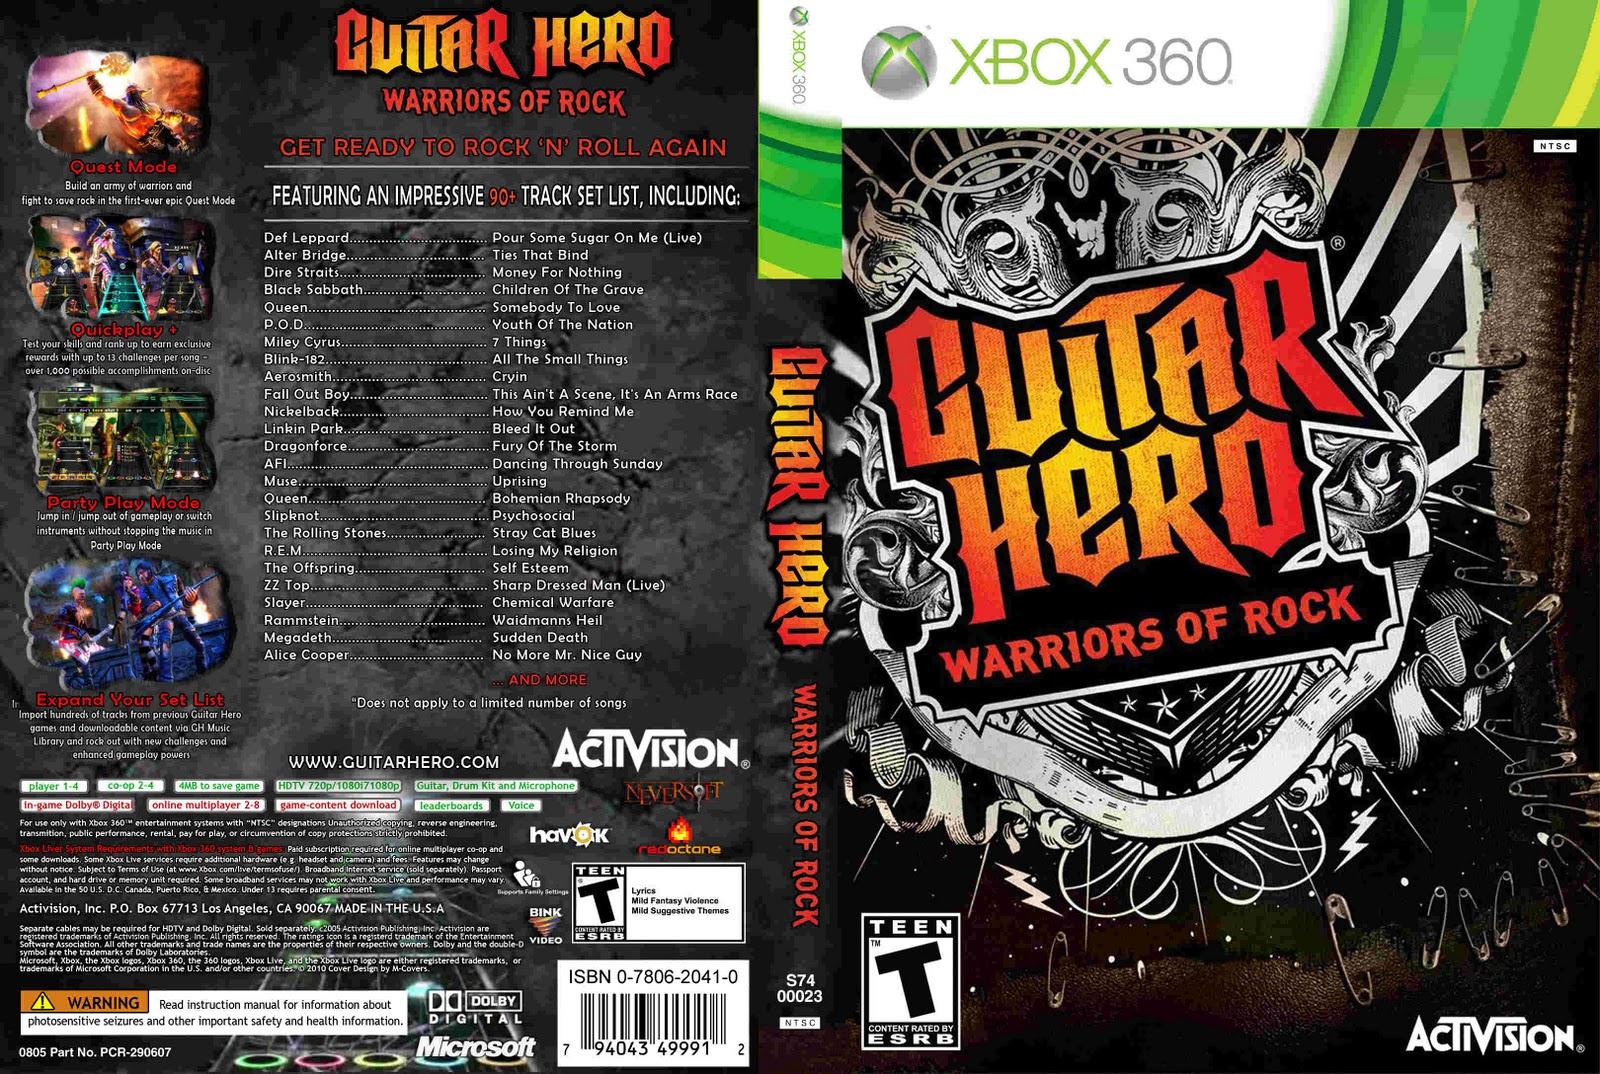 http://4.bp.blogspot.com/_gSXpAu-_FP4/TJqt6KFBQHI/AAAAAAAADBs/yUidXDBda2k/s1600/Guitar_Hero_6__Warriors_Of_Rock-%5Bfront%5D-%5Bwww.FreeCovers.net%5D.jpg